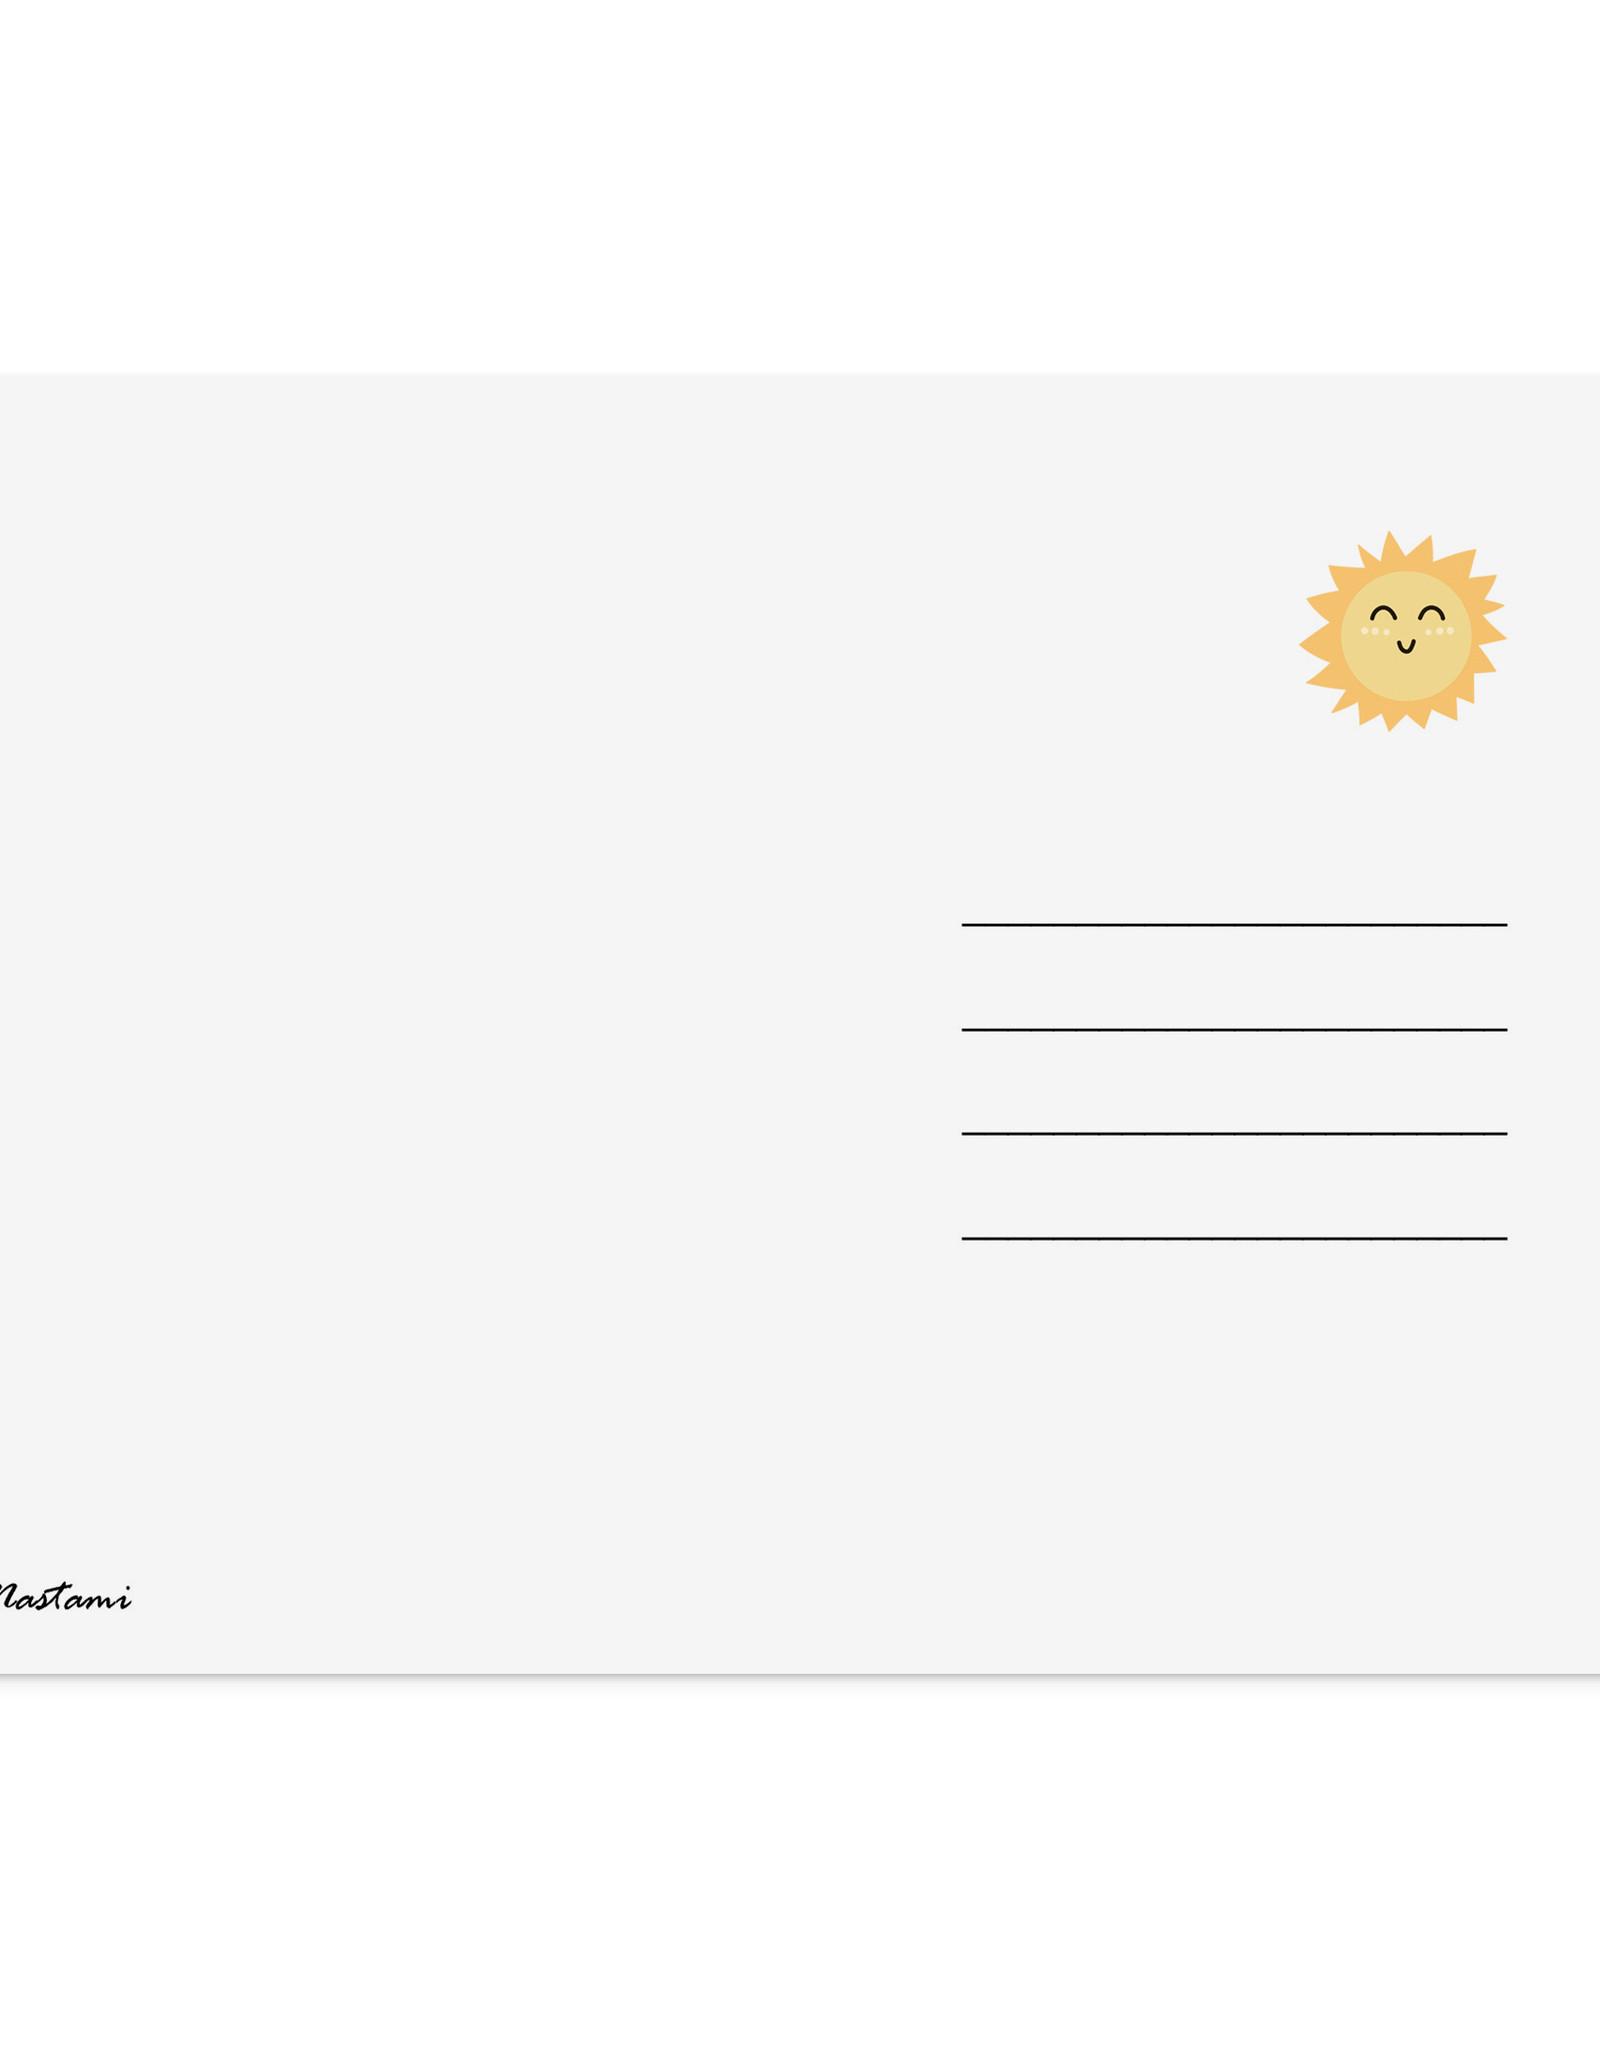 Postkarte kleines Wunder ELEFANT Baby Karte Geburt inkl. Umschlag